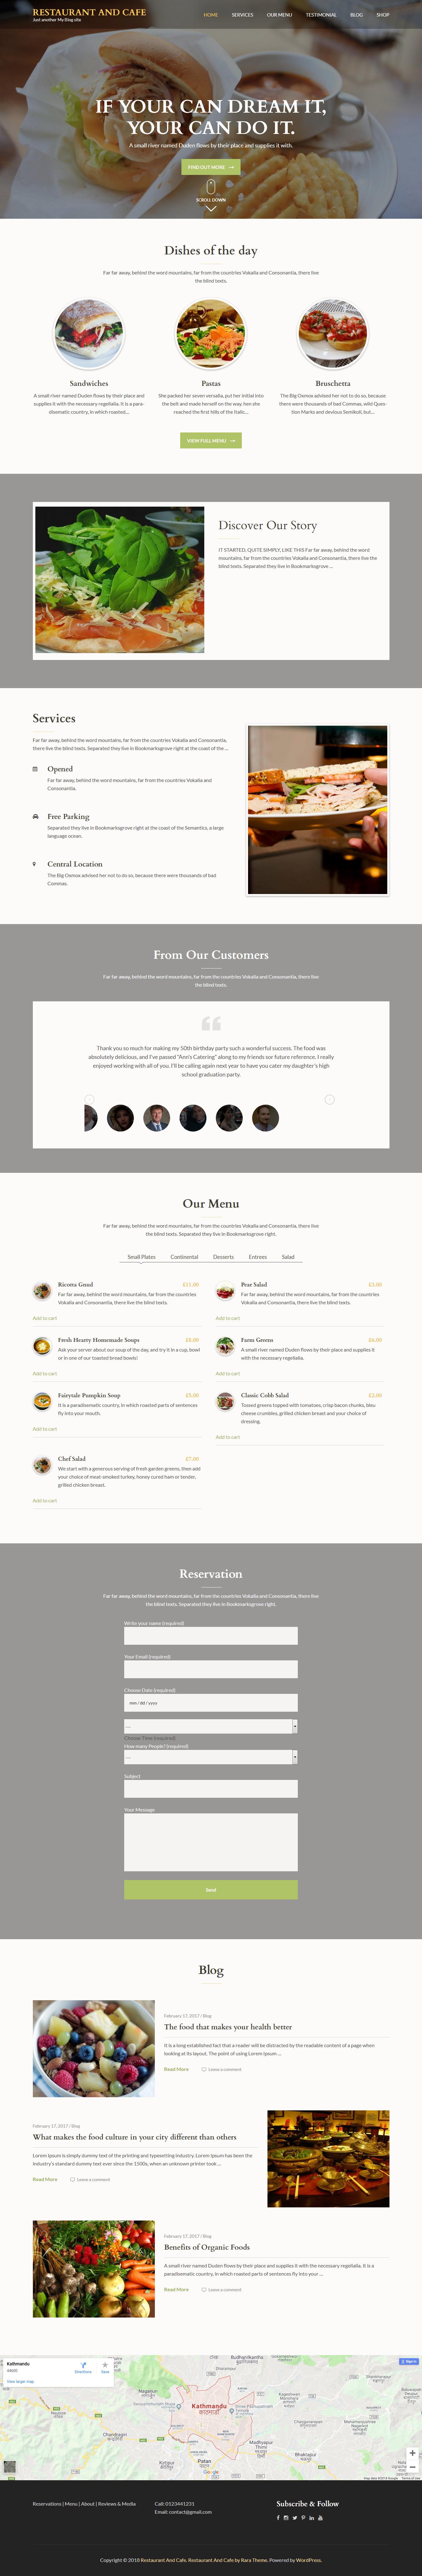 Restaurant and Cafe: el mejor tema gratuito de WordPress para restaurantes